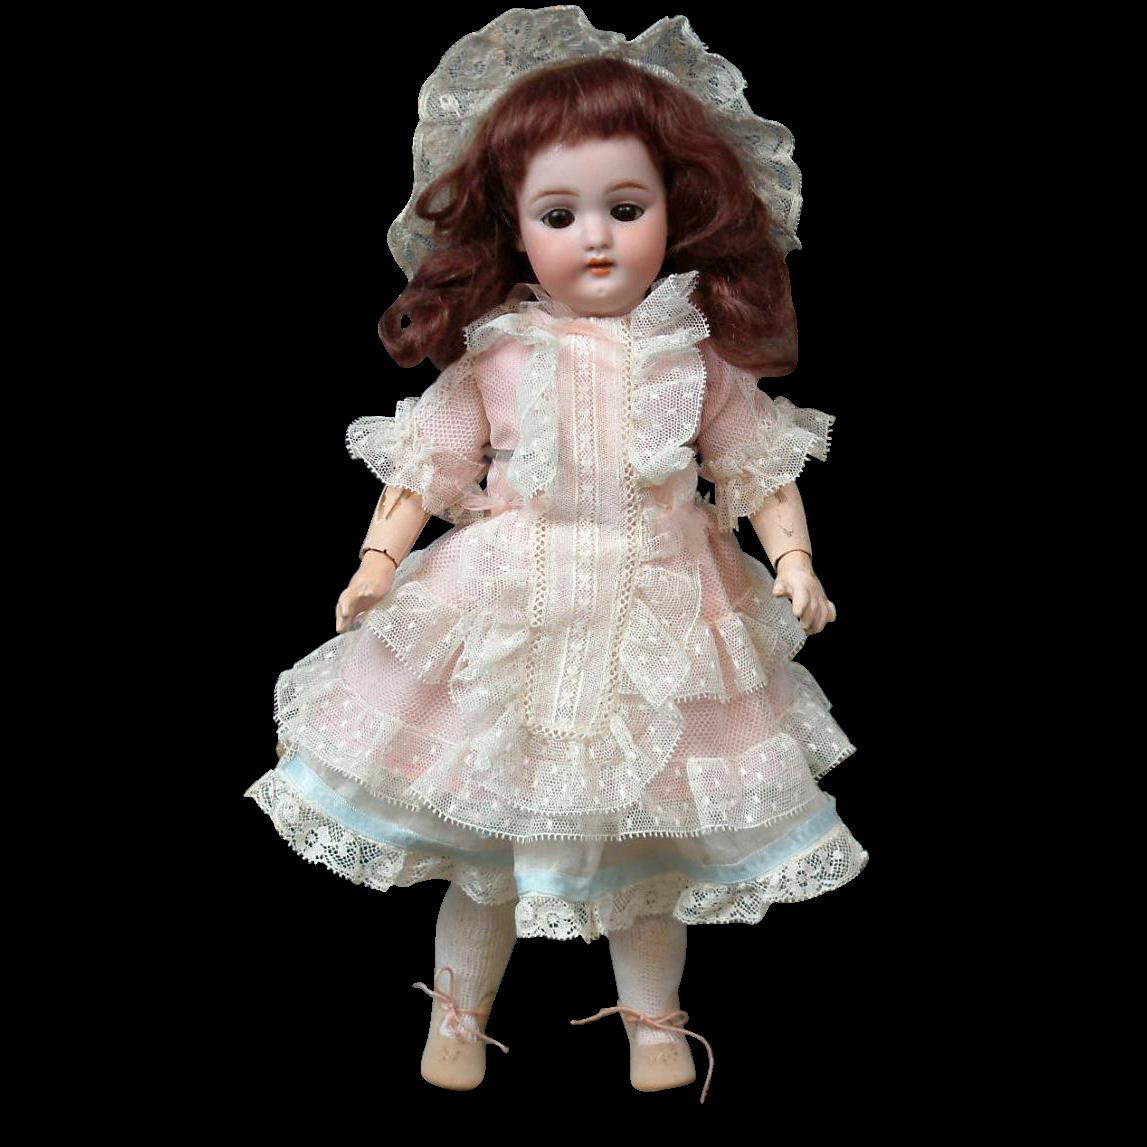 "Sweet Petite 12"" Simon & Halbig 1079 Antique Bisque Doll"